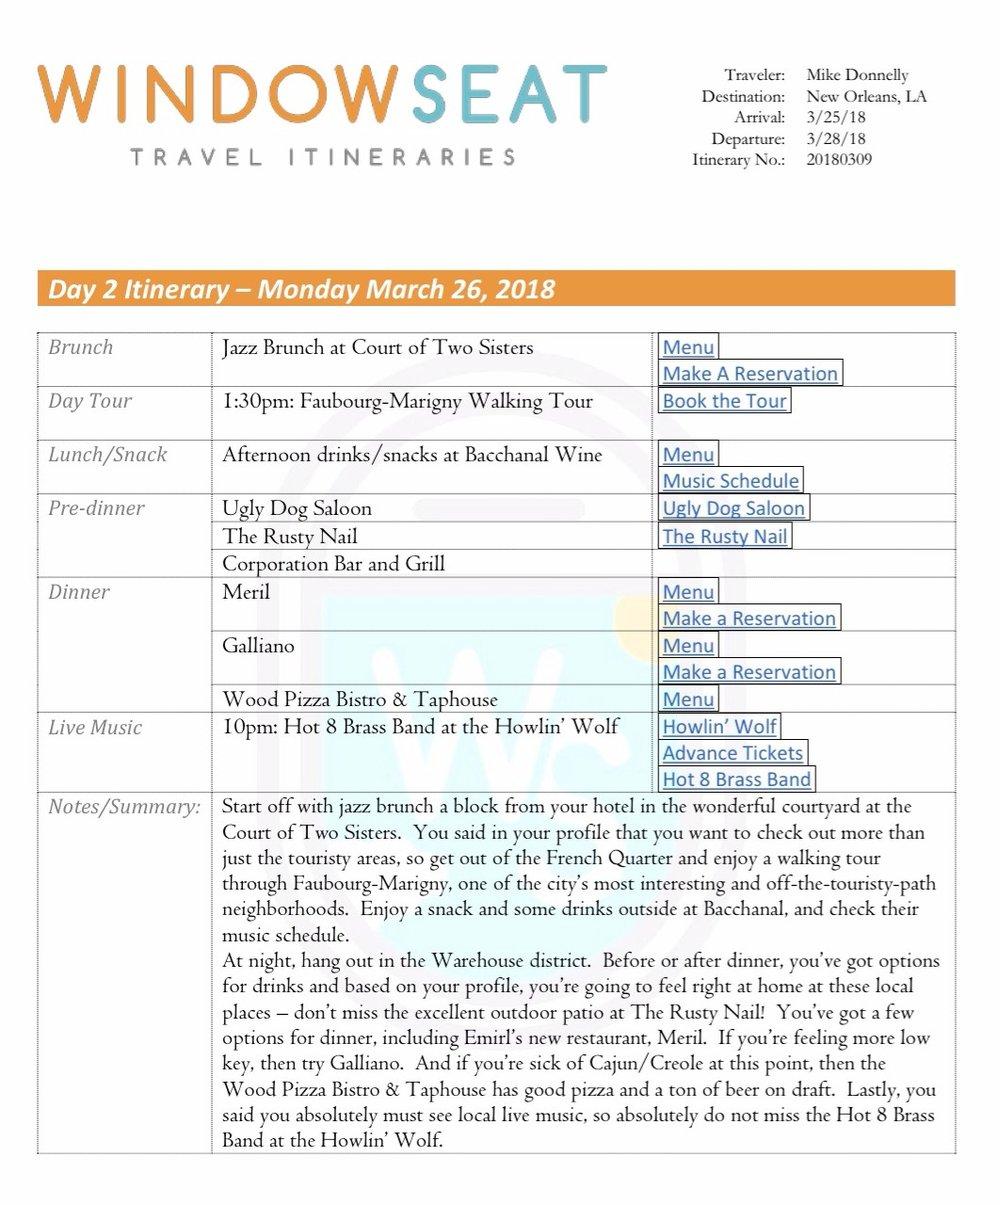 Window Seat Sample Itinerary.jpg